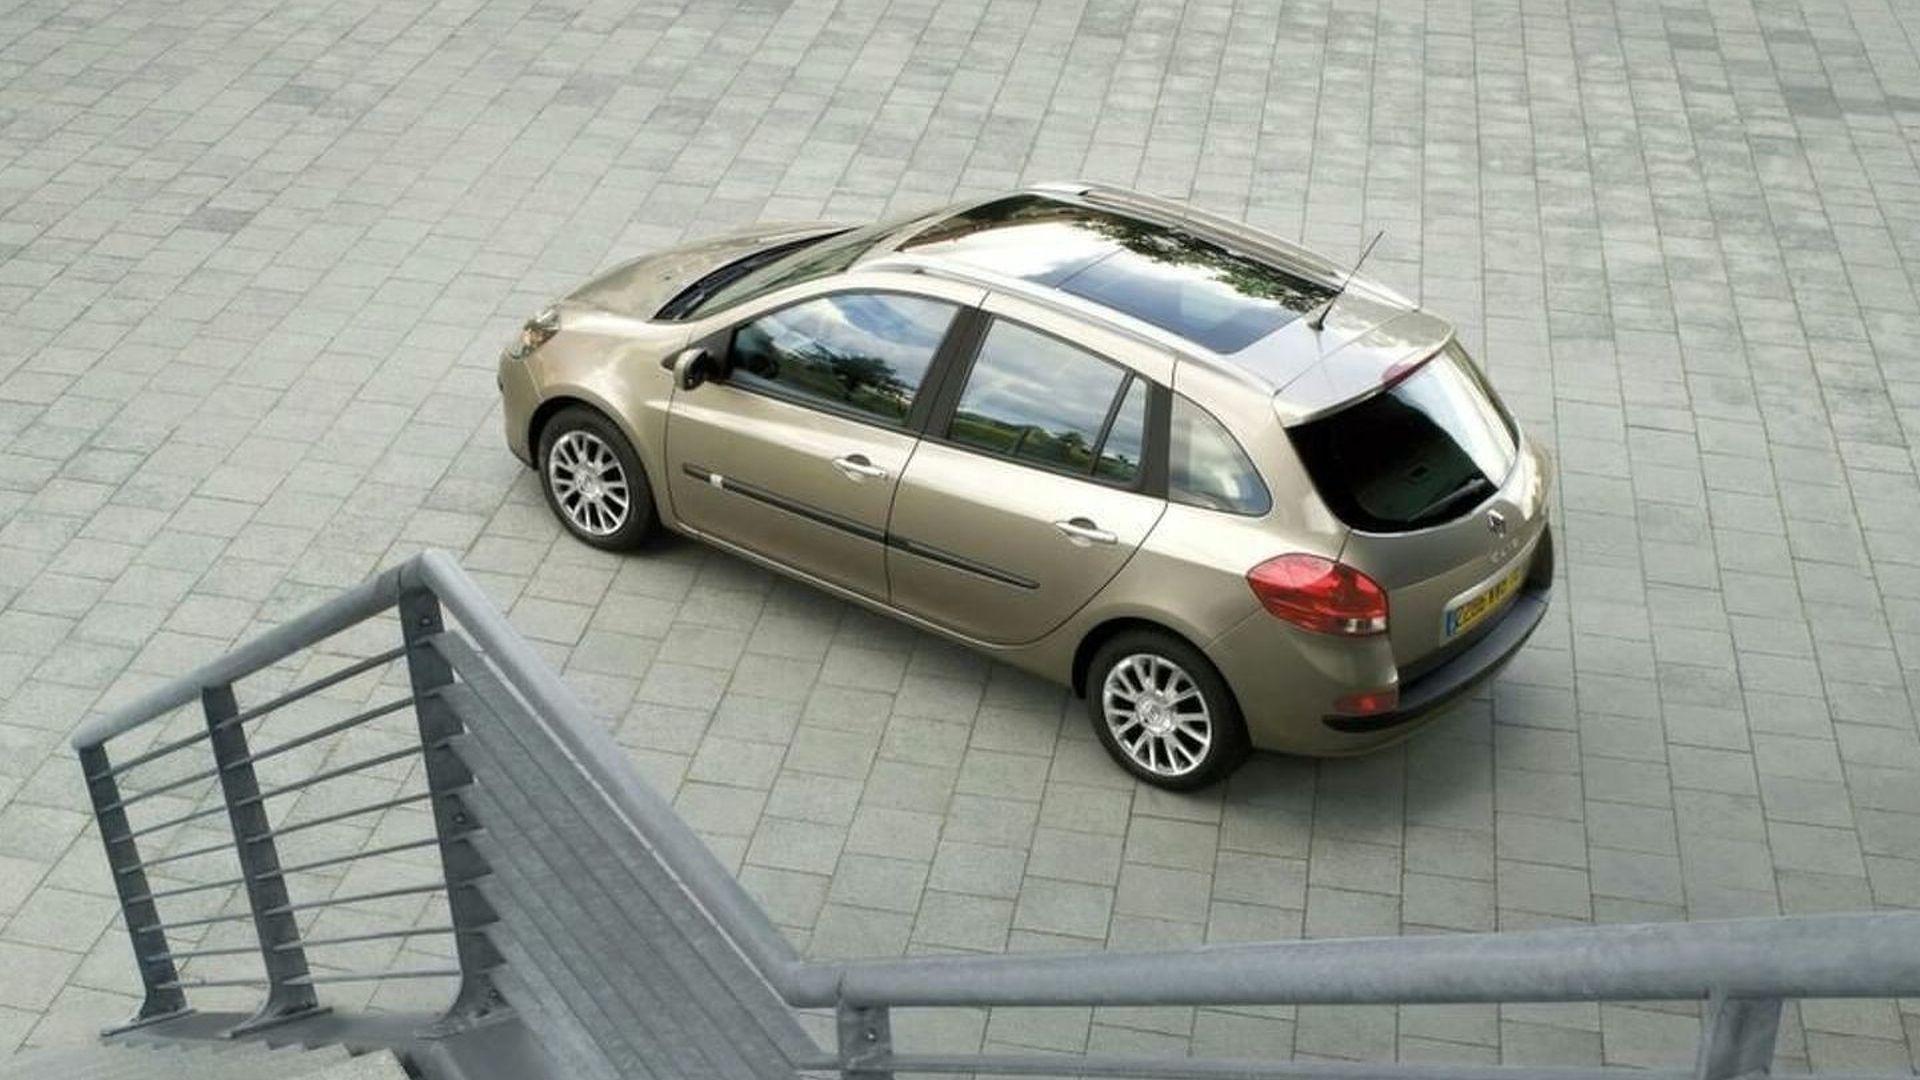 Renault Frankfurt's